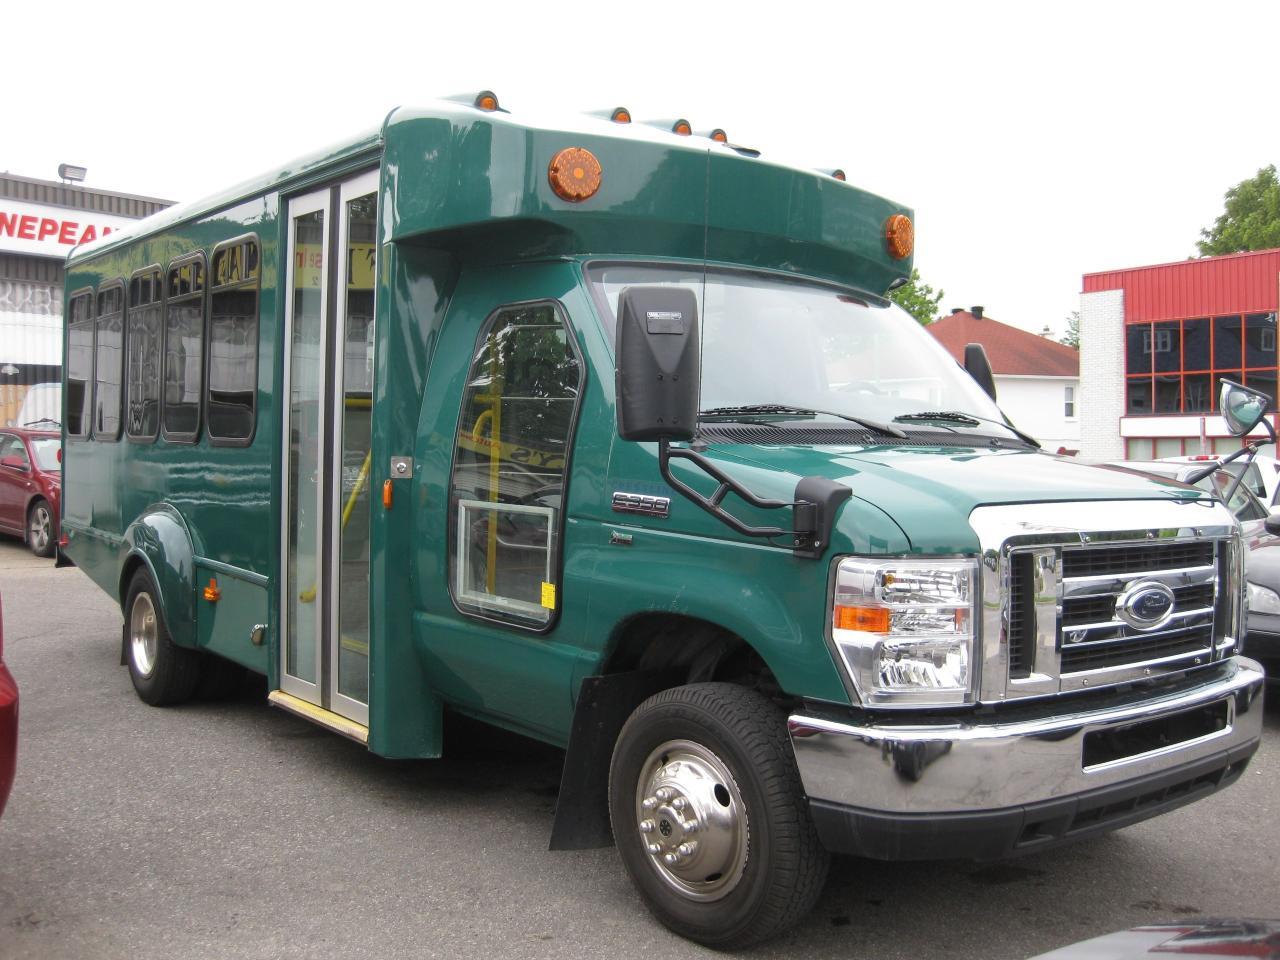 2010 Ford Econoline E350 Superduty Bus 16 Pass+driver 5.4L 8cyl. AC